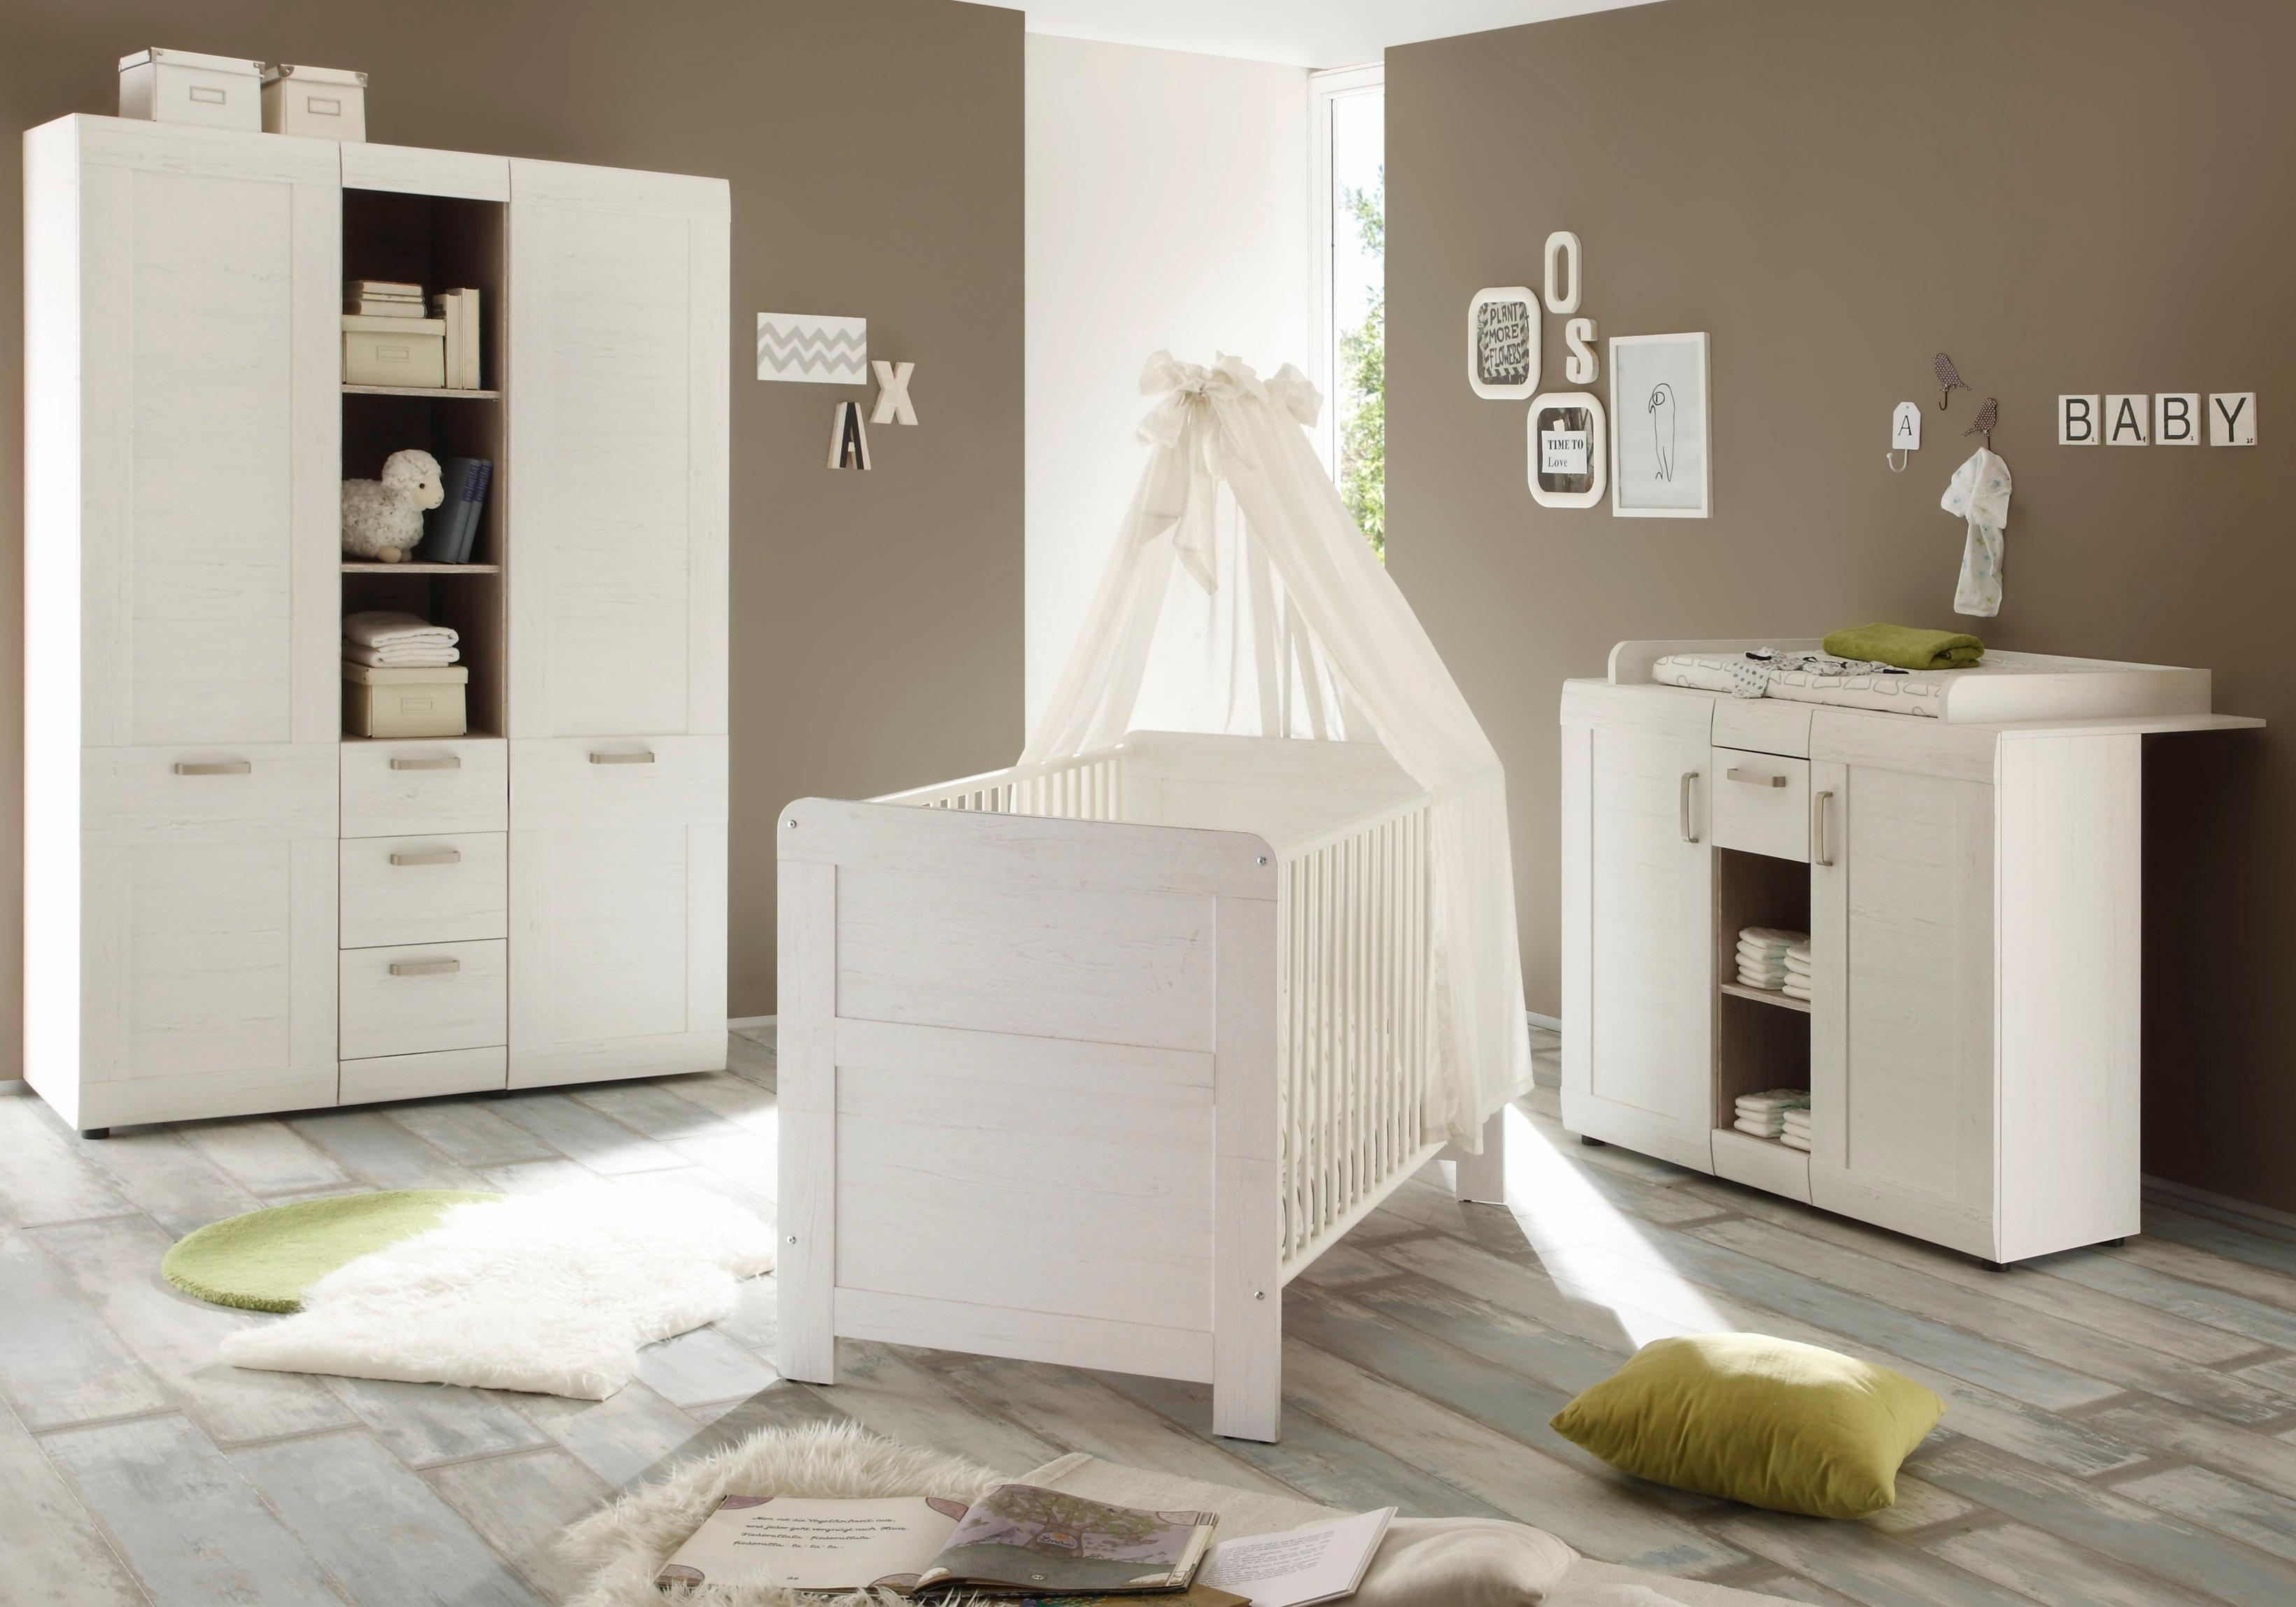 Complete Babykamer 3 Delig.Complete Babykamer Shoppen Nu Gratis Thuisbezorgd Otto